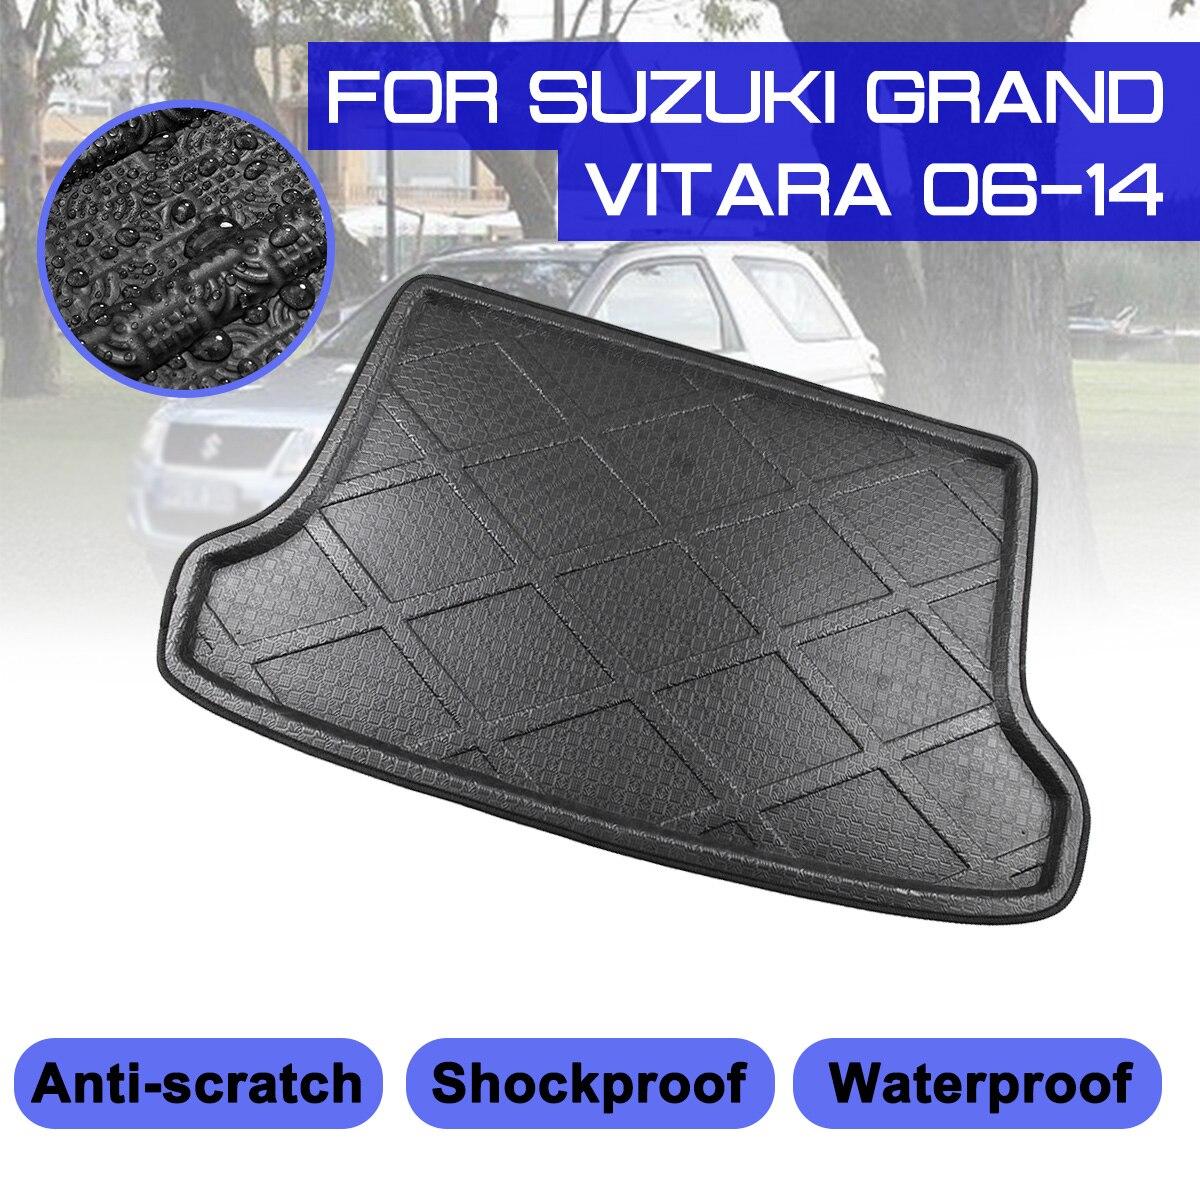 For Suzuki Grand Vitara 2006 2007 2008-2014 Car Rear Trunk Boot Mat Waterproof Floor Mats Carpet Anti Mud Tray Cargo Liner